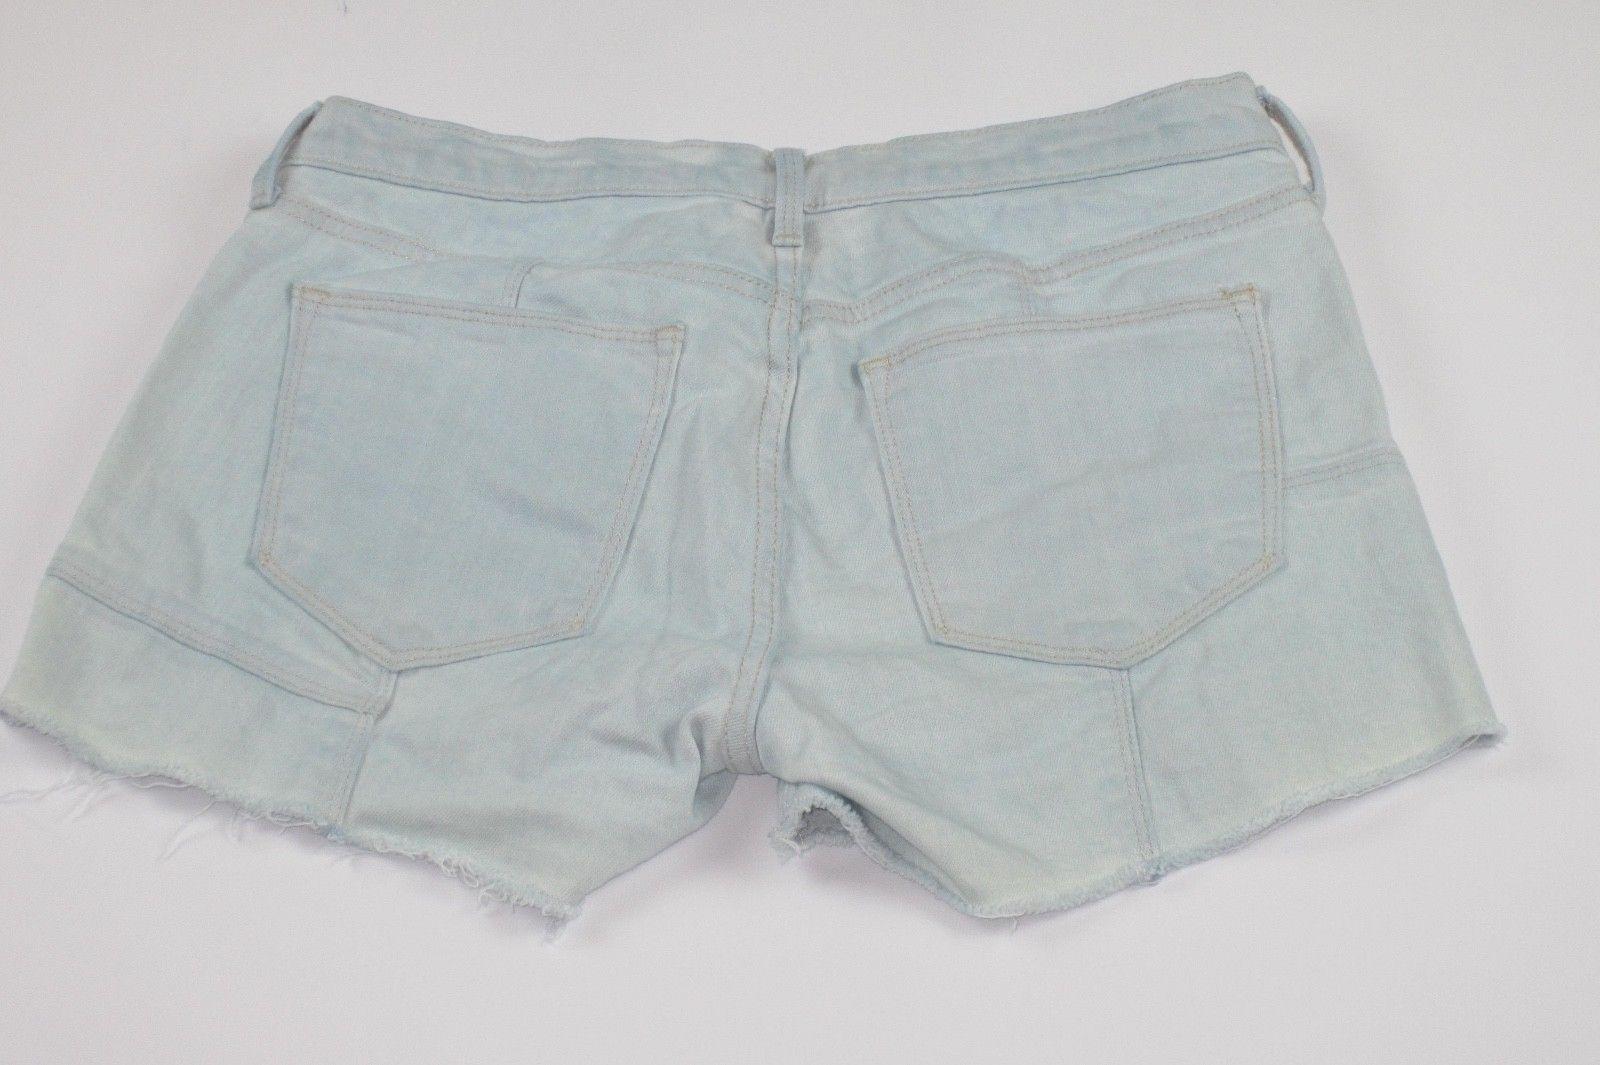 Women GAP 1969 Cut-Off Frayed Bleached Patchwork denim jean shorts Size 4/27R